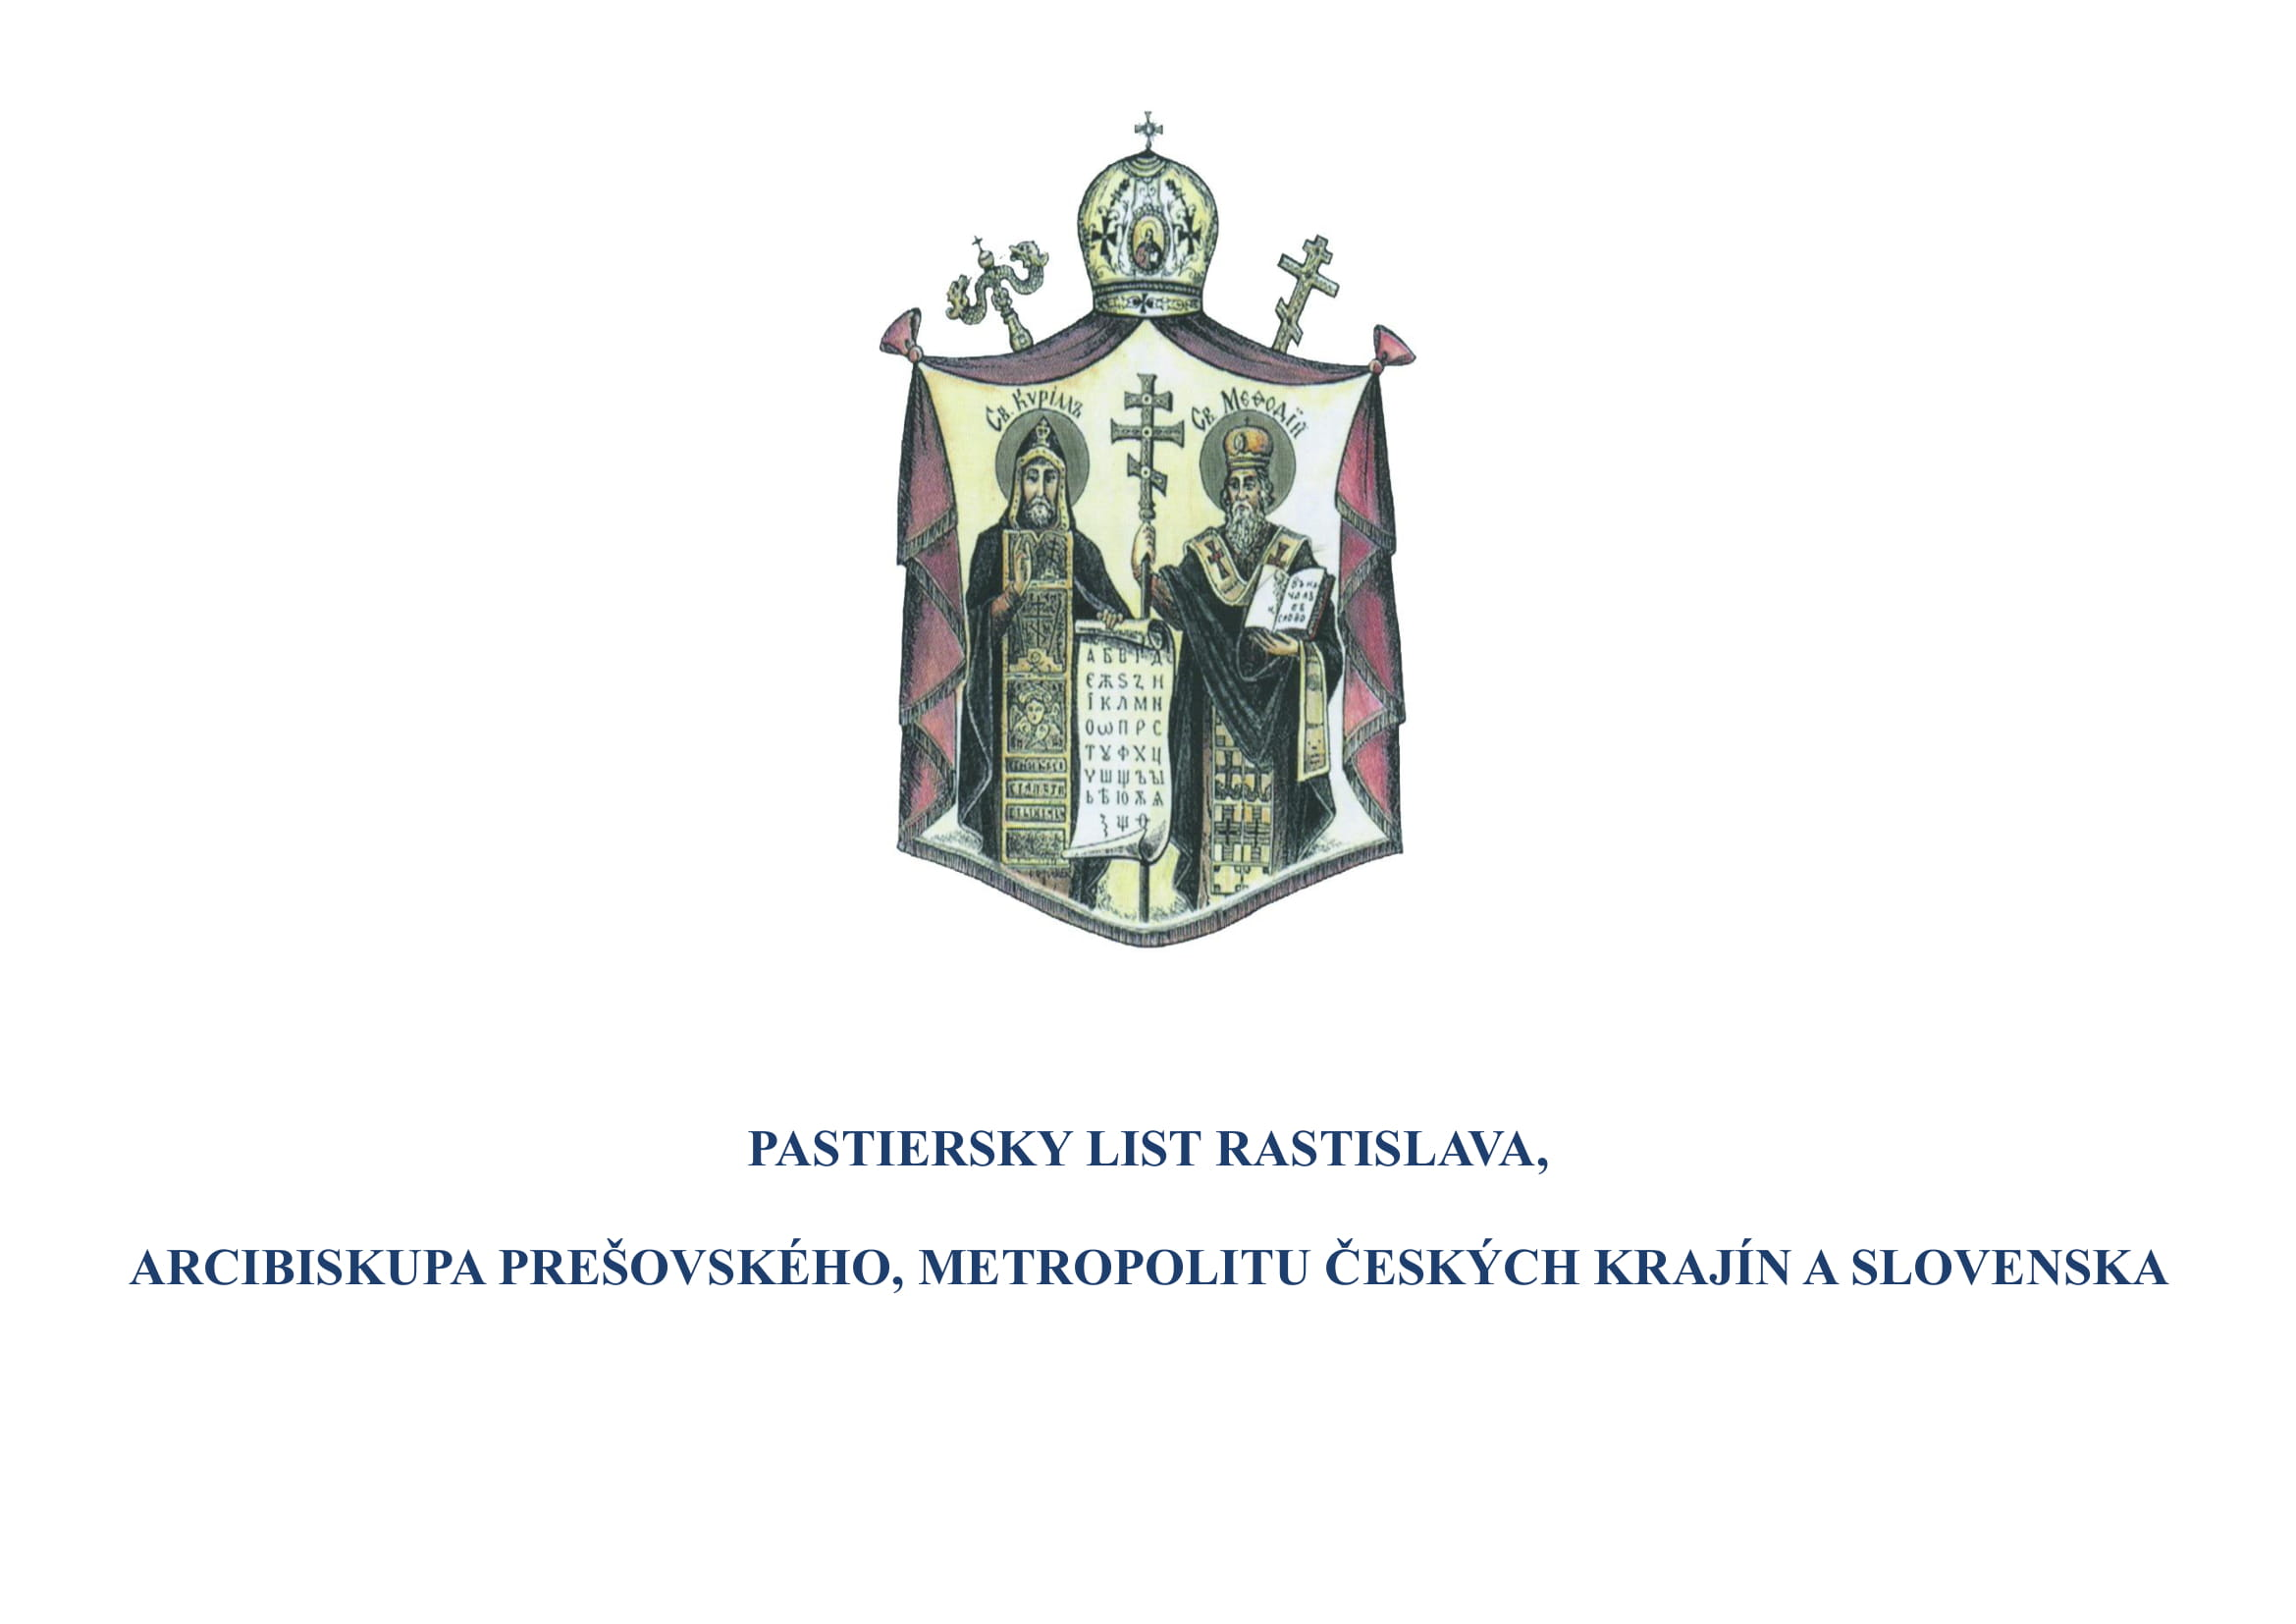 PASTIERSKY LIST RASTISLAVA,        ARCIBISKUPA PREŠOVSKÉHO,    METROPOLITU          ČESKÝCH KRAJÍN                      A SLOVENSKA